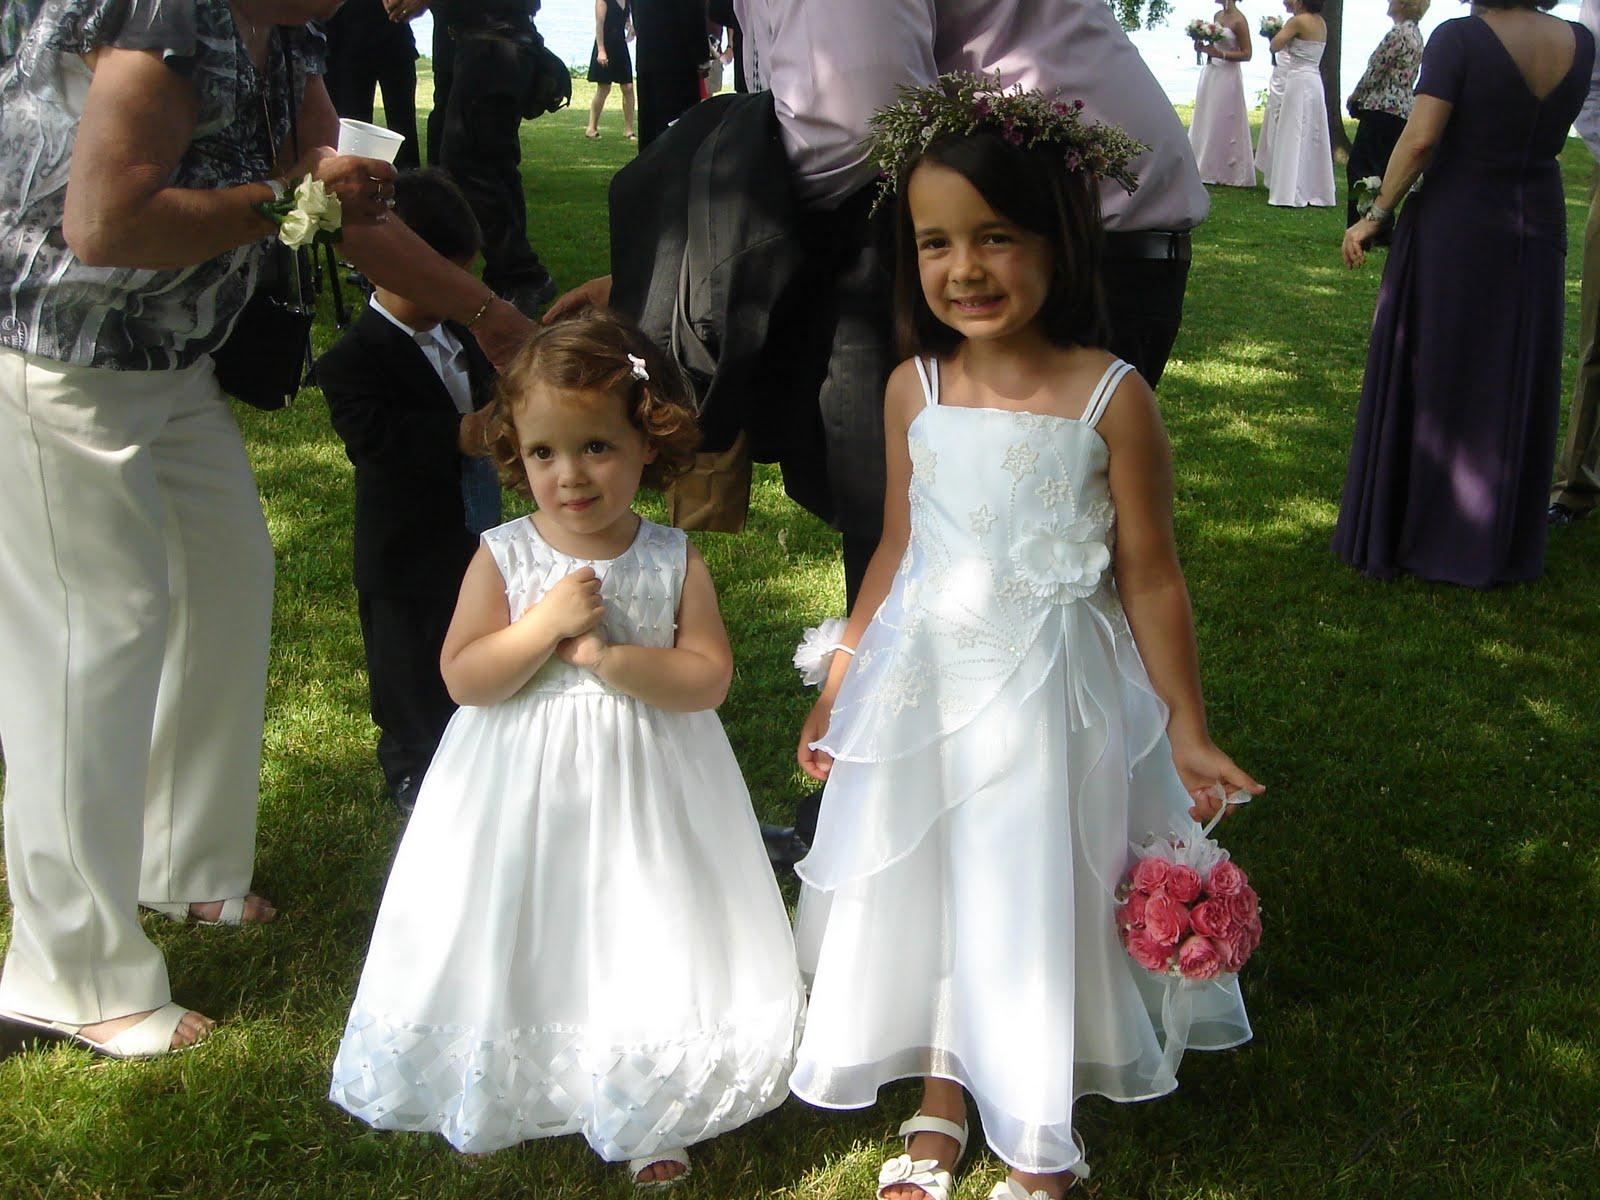 Wedding dresses: monkeys in wedding dress